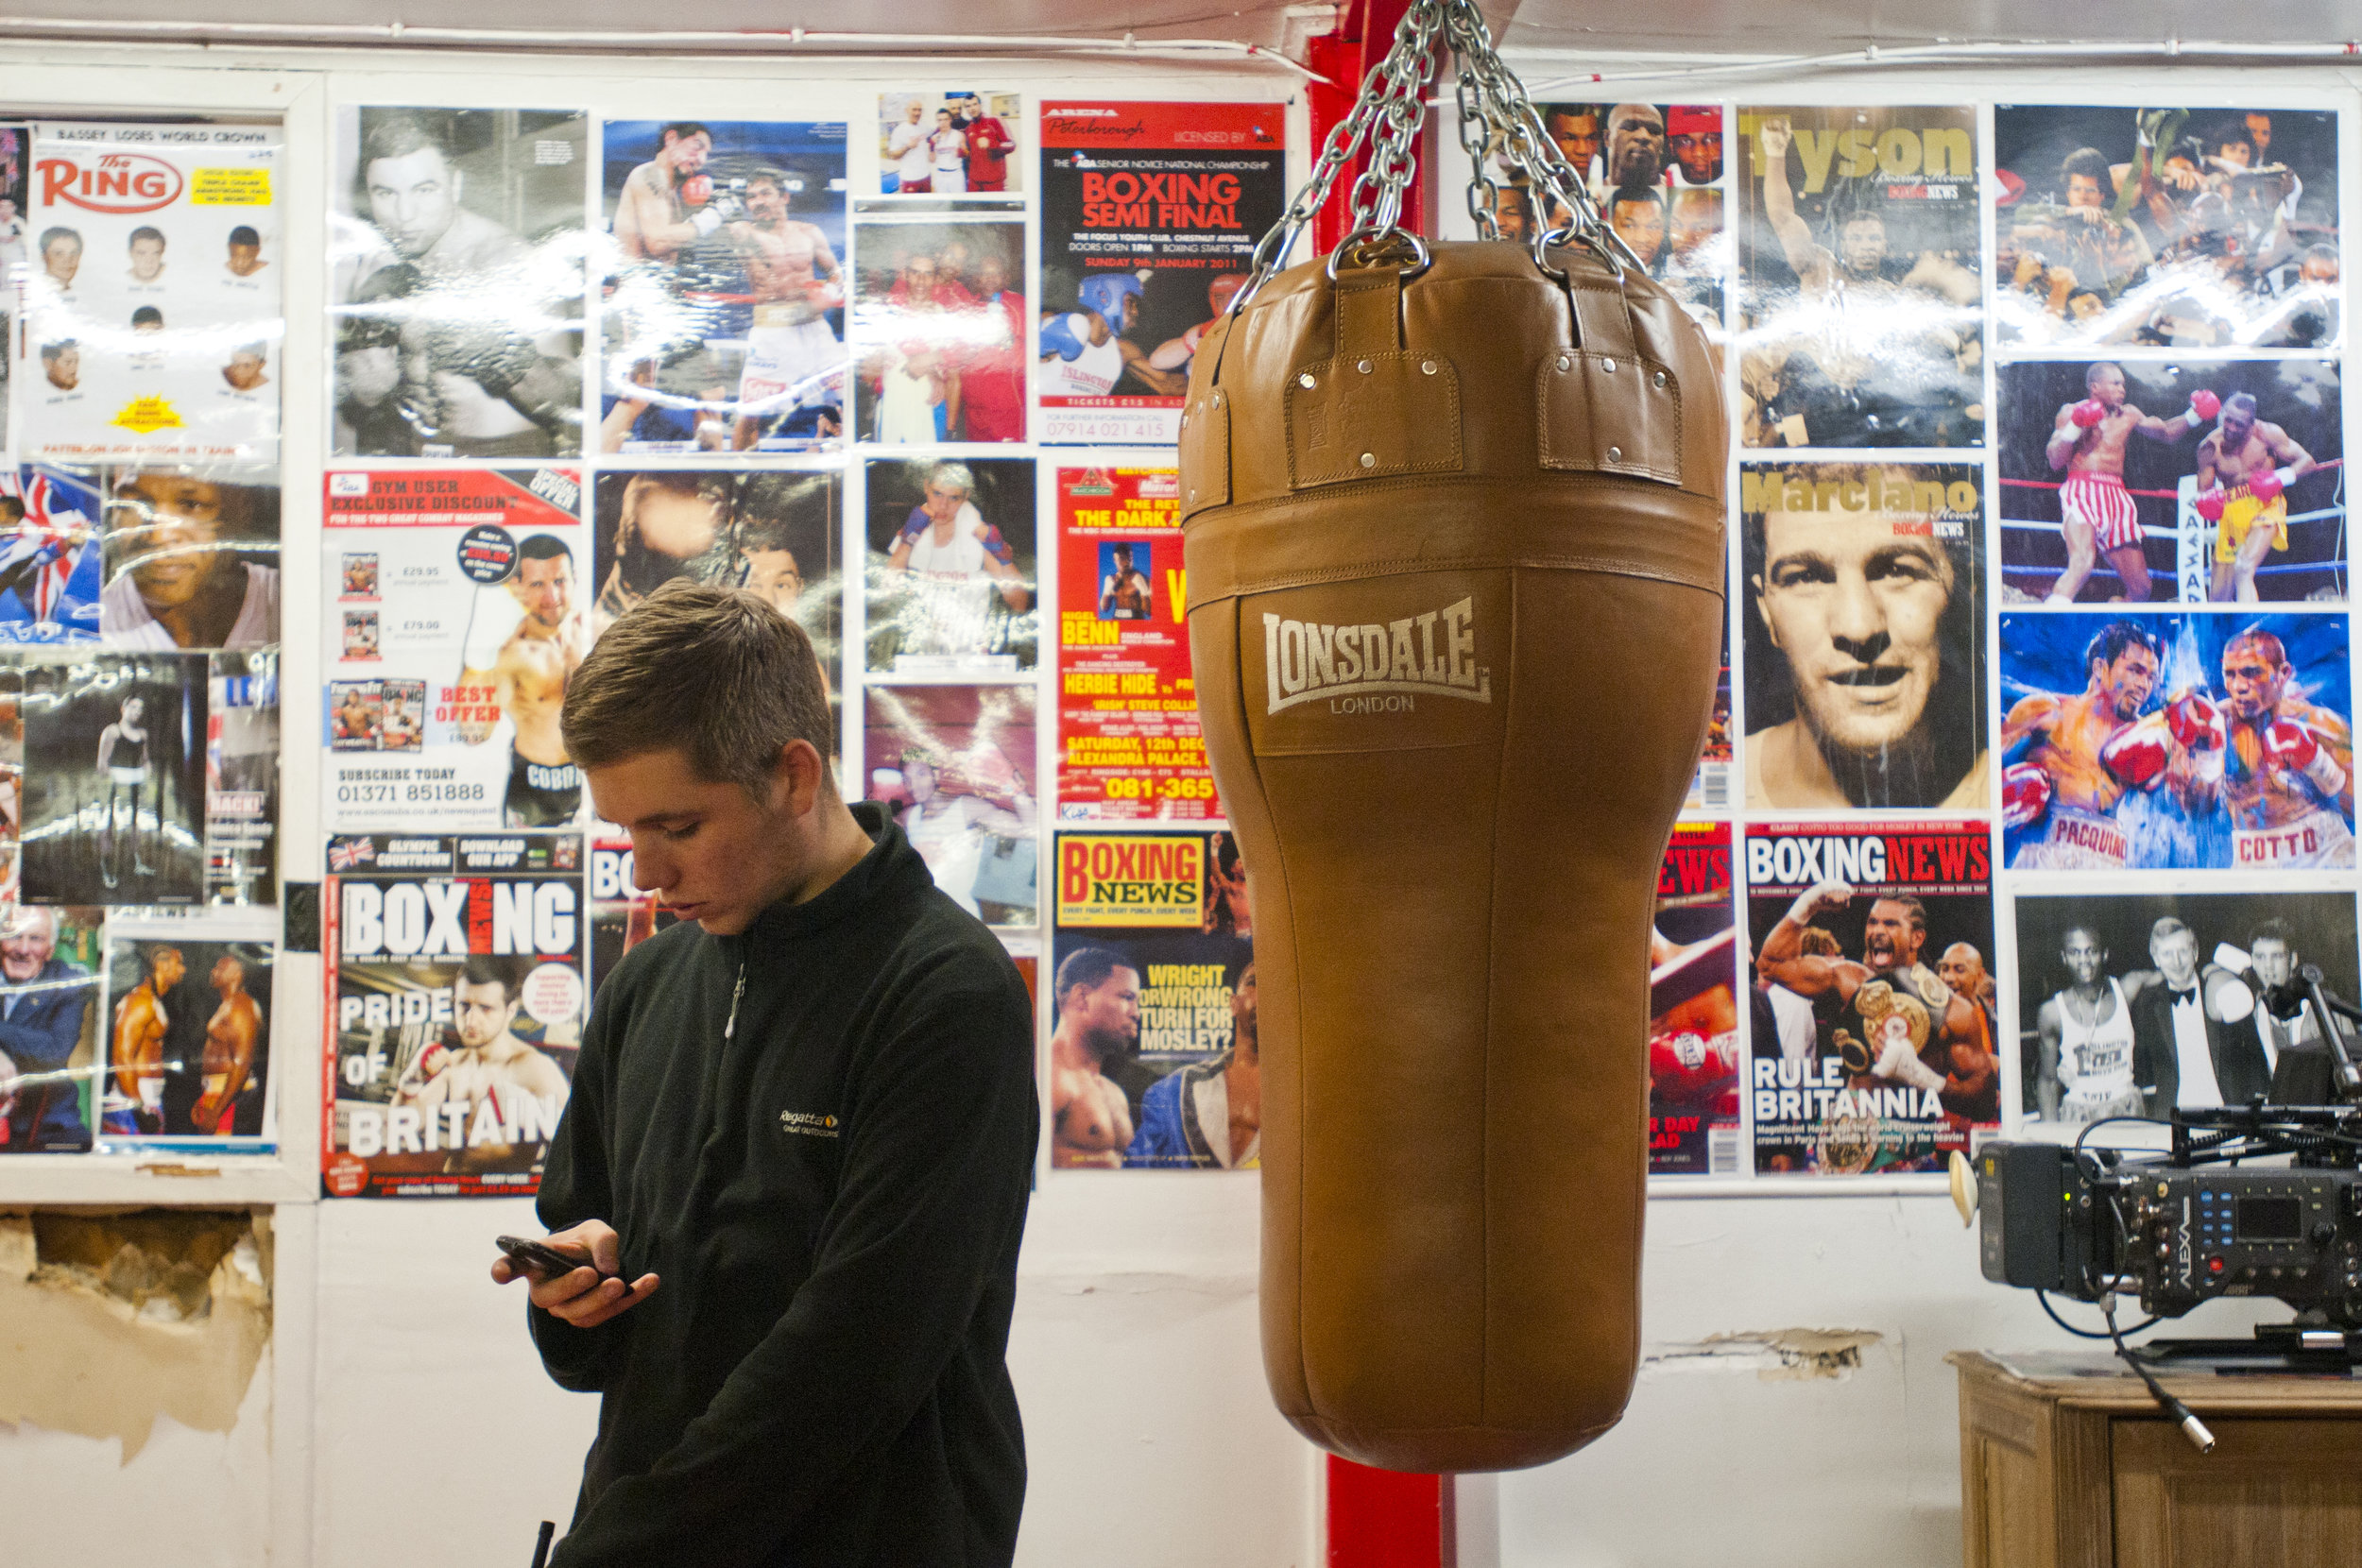 boxinggym-9352 copy.jpg